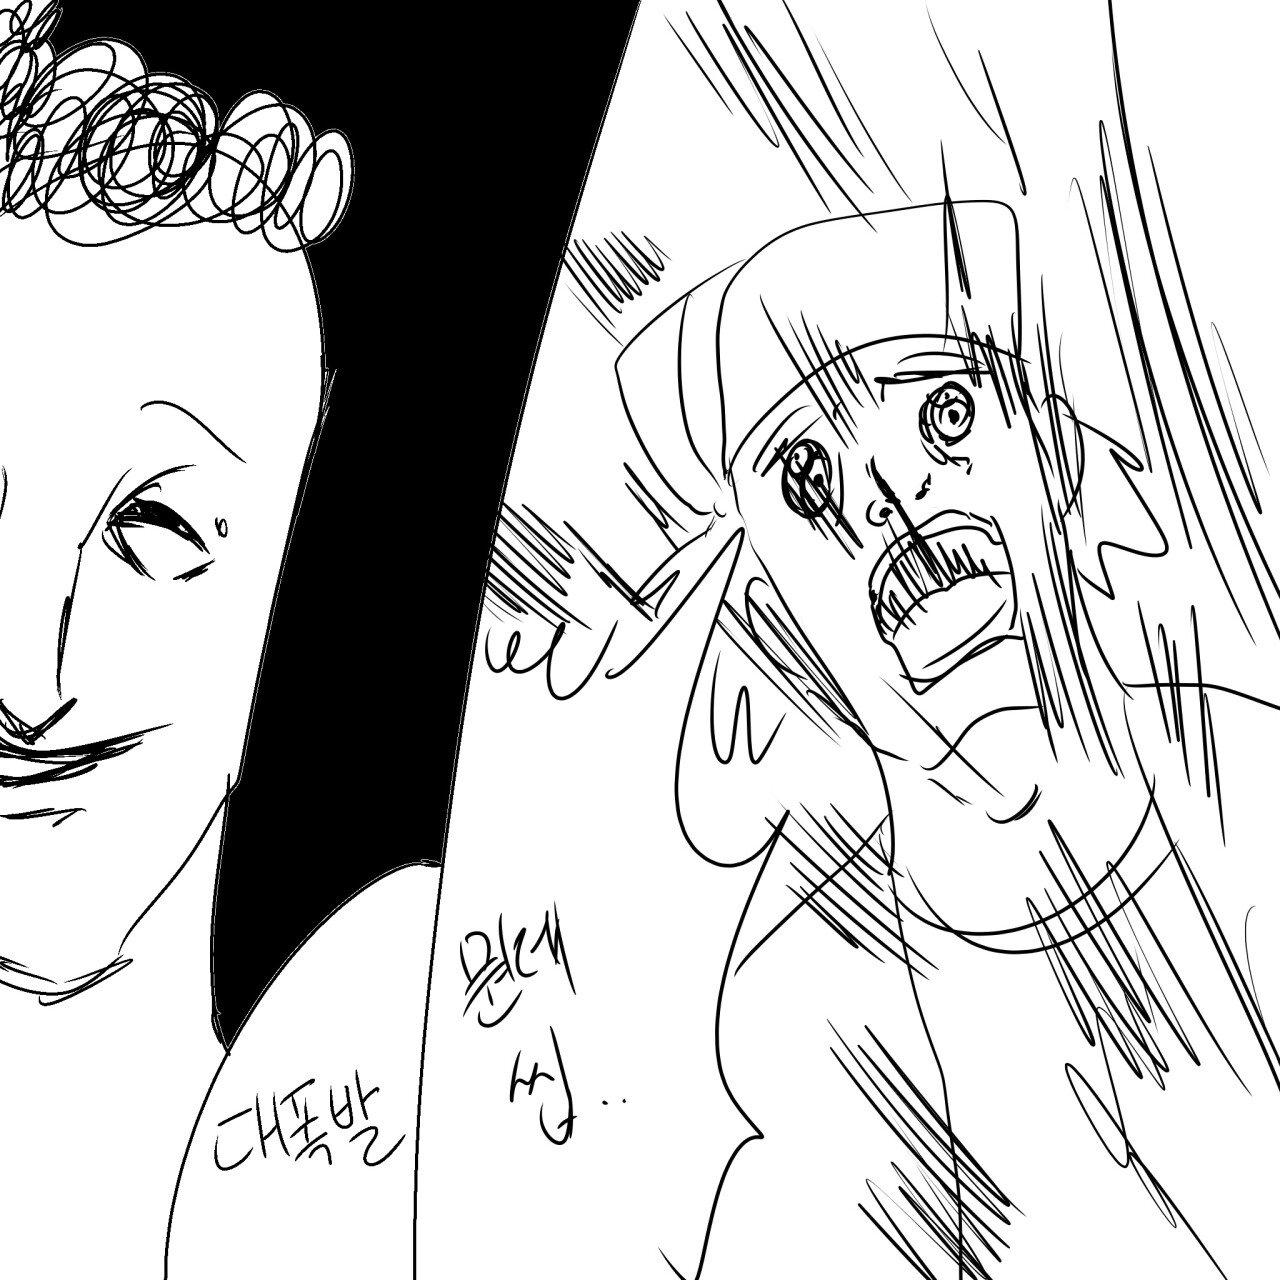 cartoon-20190528-184810-017.jpg 포켓몬 테러리스트 만화.manwha 포켓몬 극한의 효율충...MANHWA